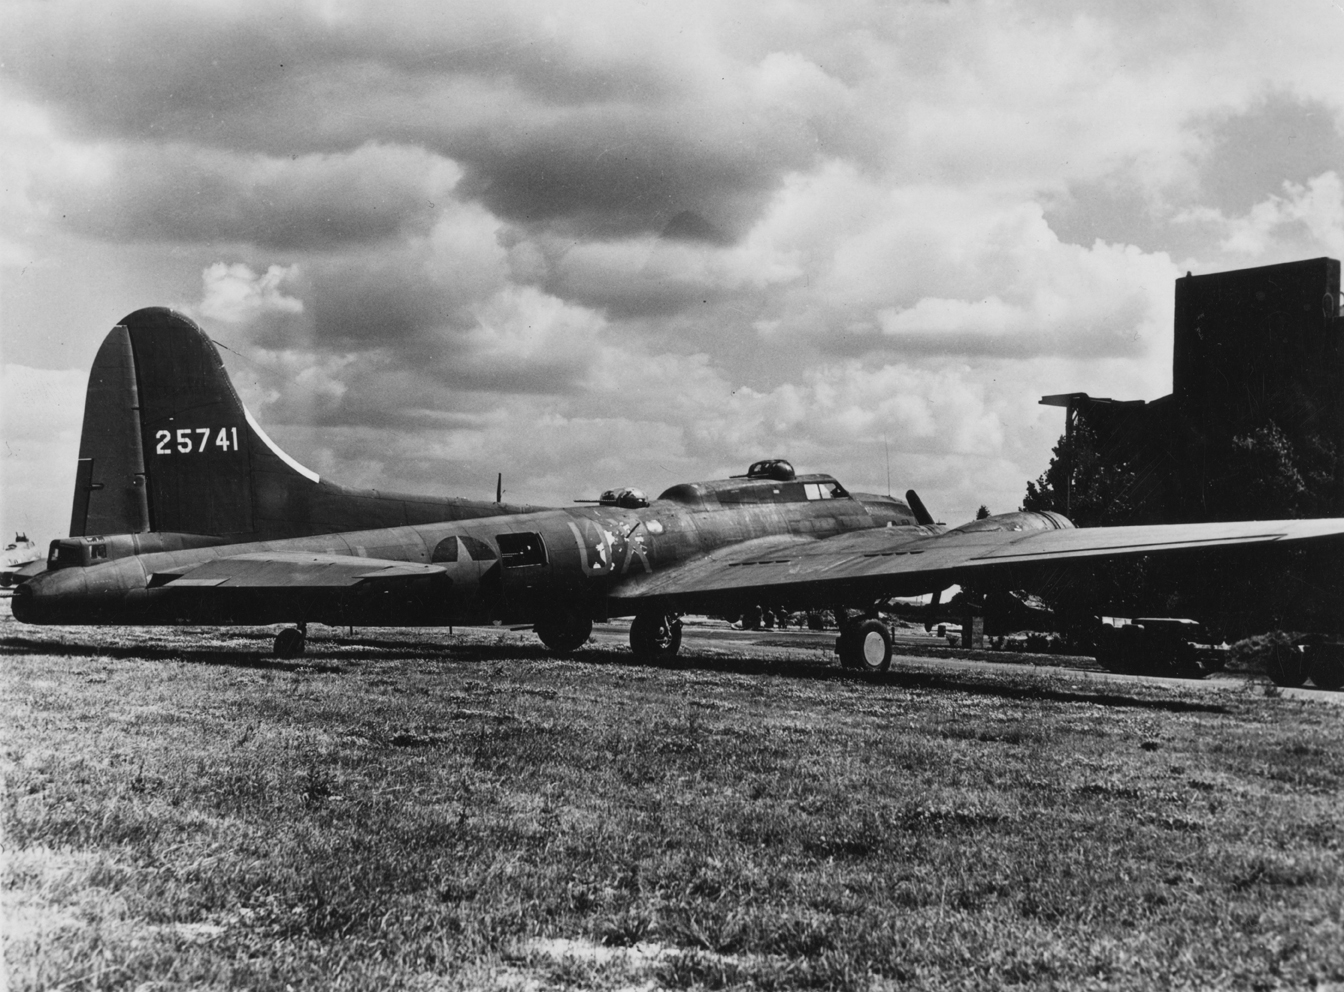 B-17 #42-5741 / Guardian Angel